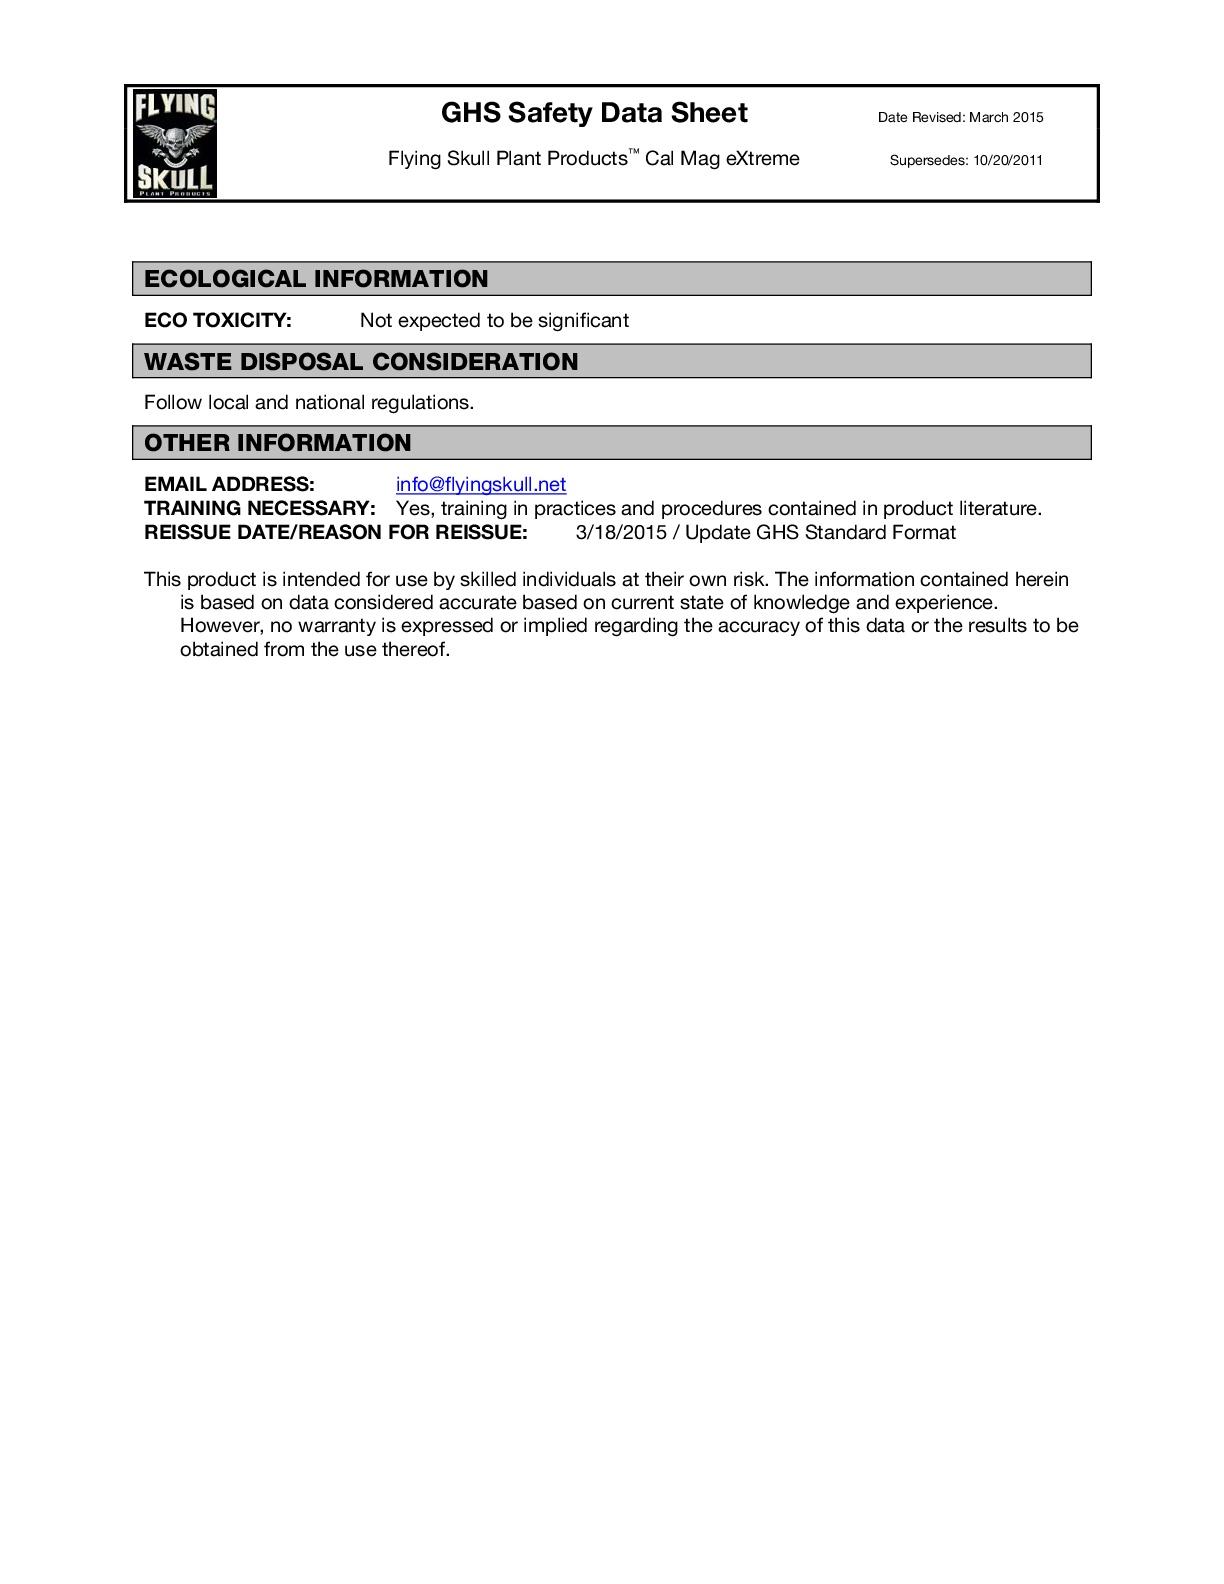 cal-mag-extreme-safety-data-sheet-p3.jpg